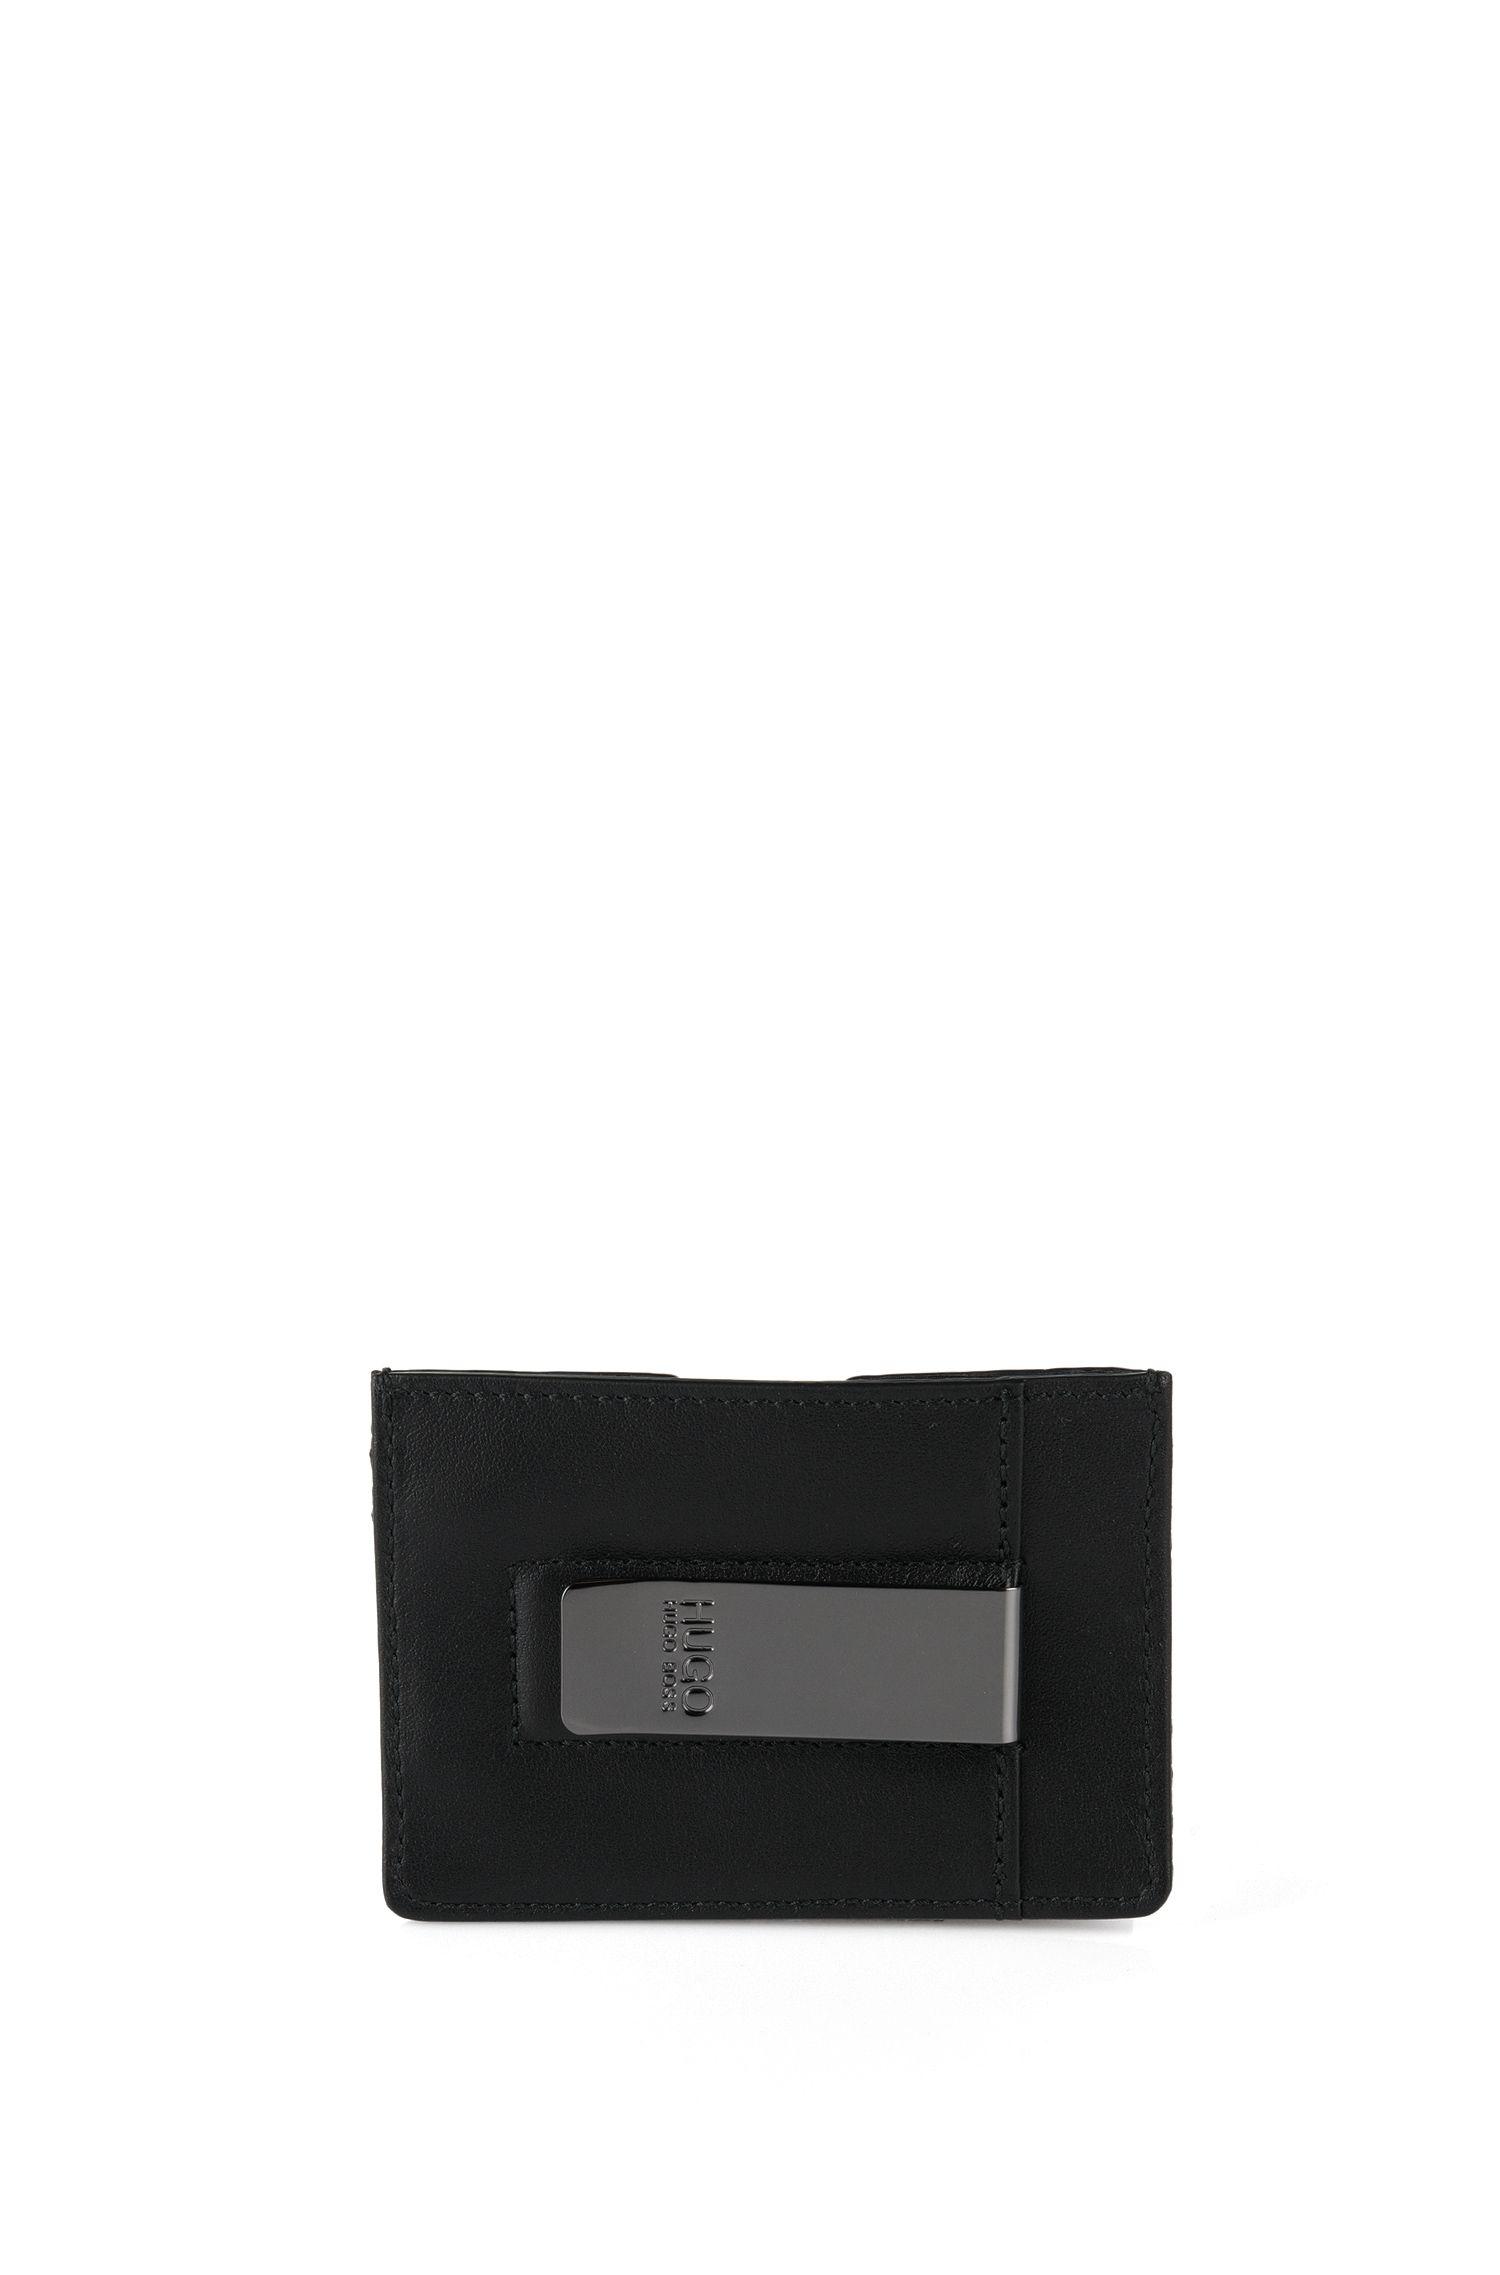 'Paora' | Textured Leather Money Clip Wallet